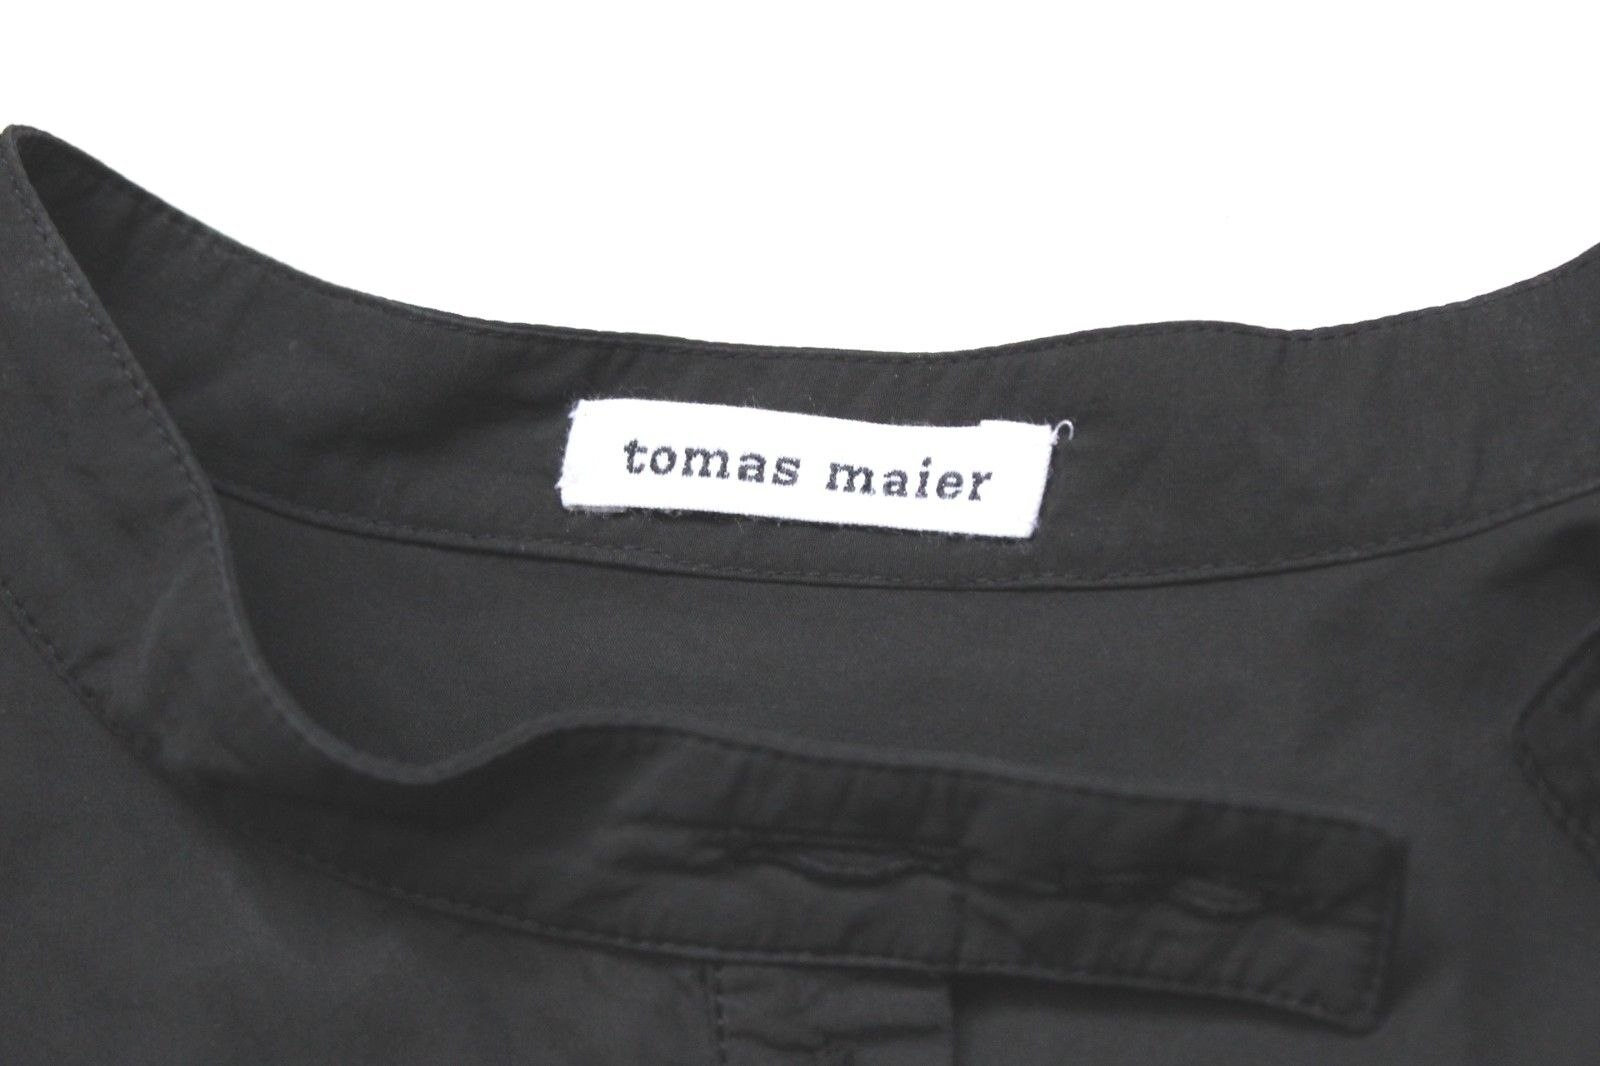 Tomas Maier cotone manica sbuffo sbuffo sbuffo nero Camicia Camicetta US 6 17bef3